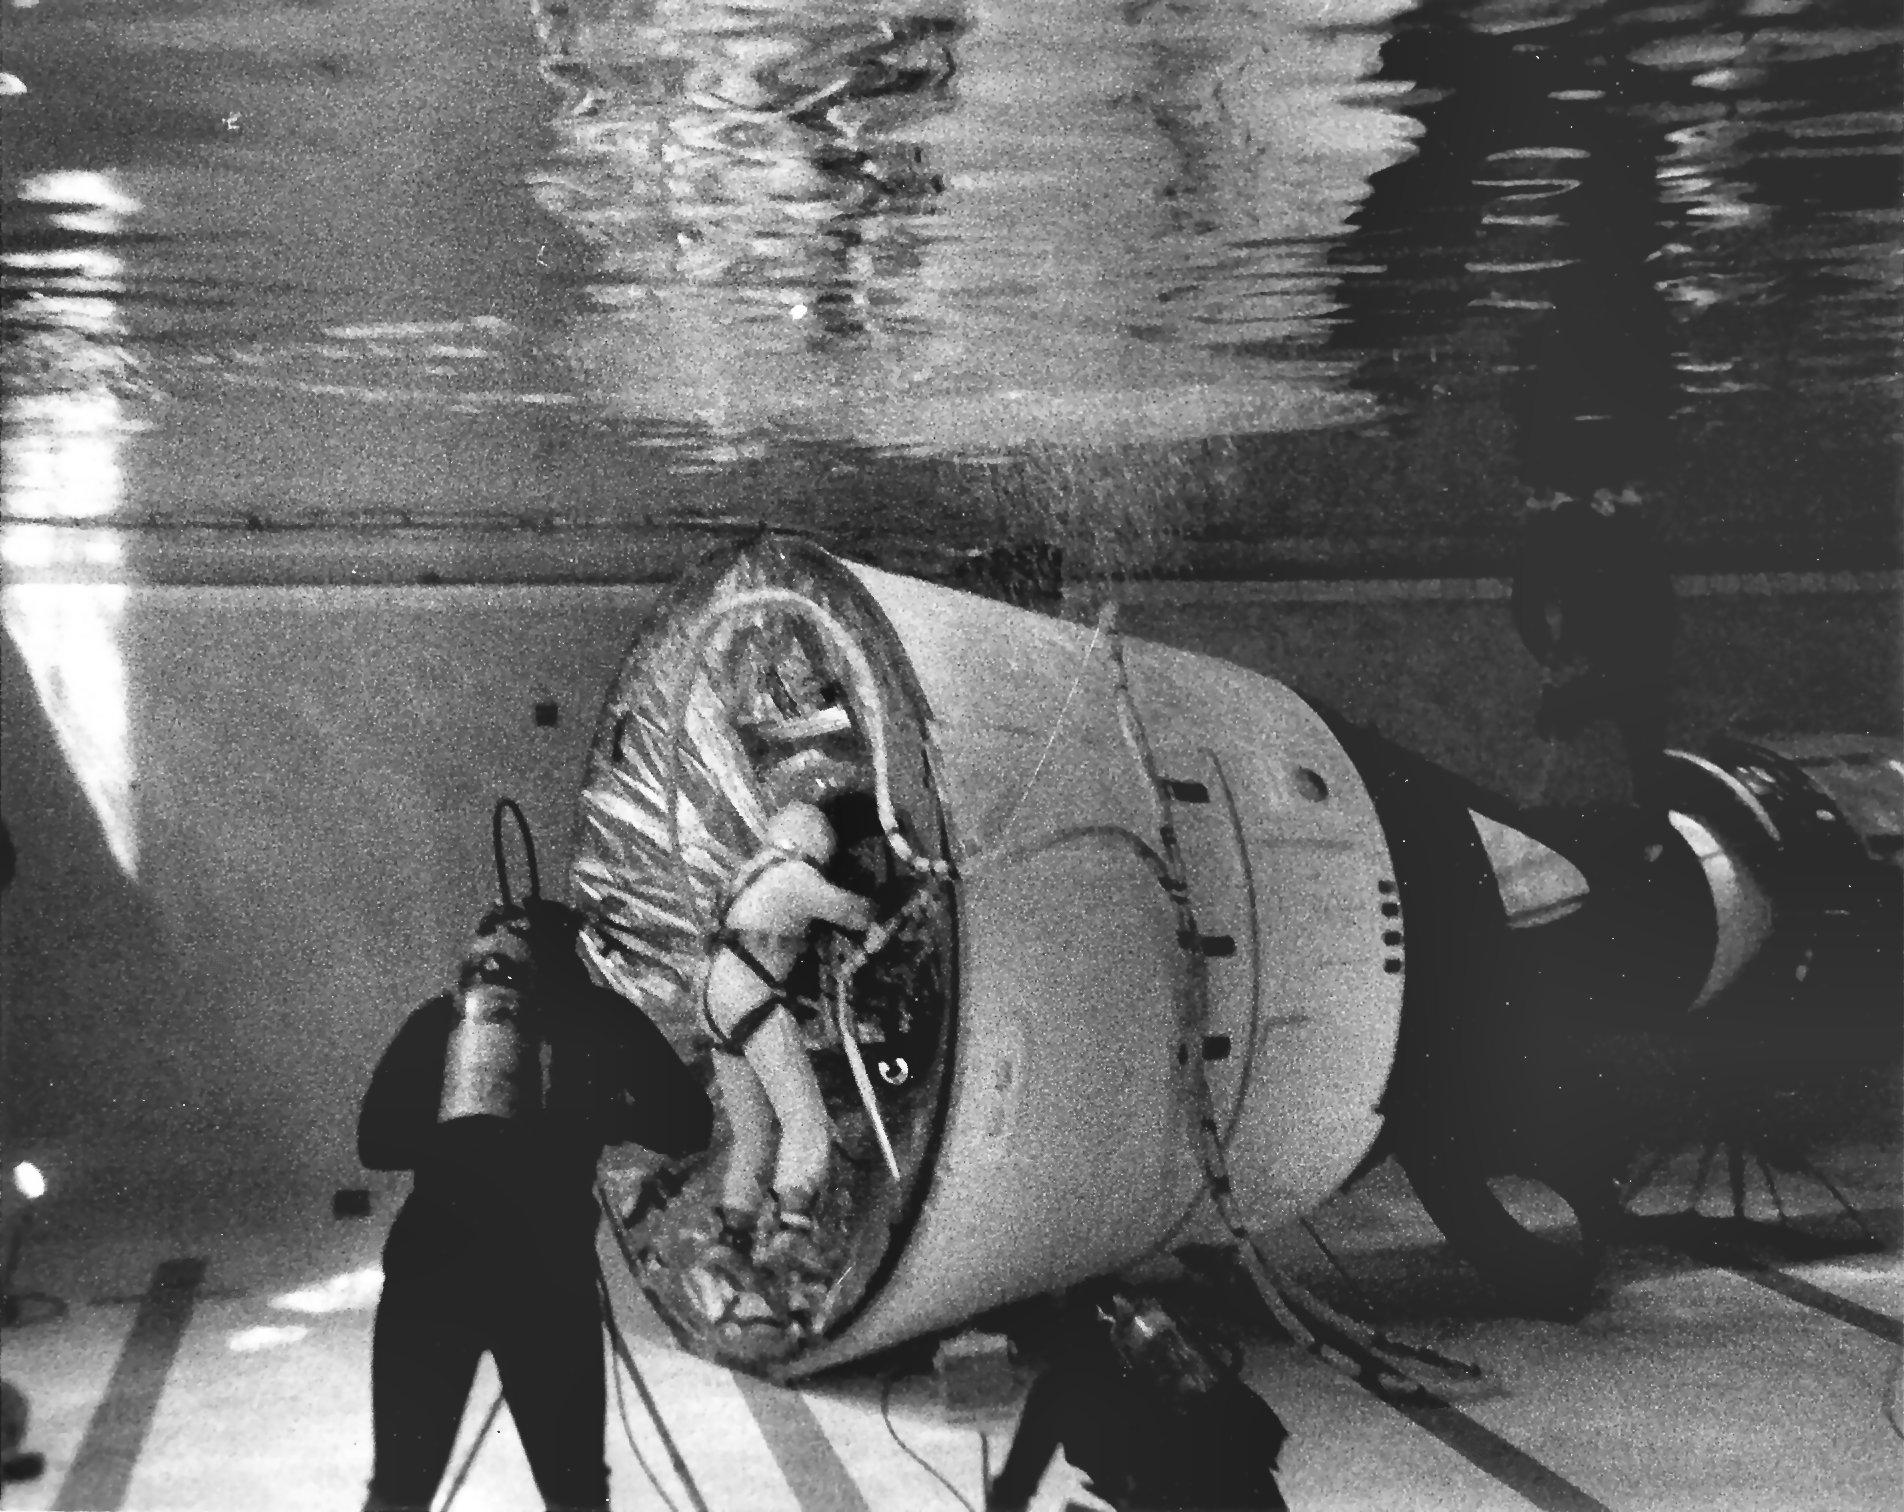 Buzz Aldrin trains for his EVAs in the Neutral Buoyancy Simulator pool. Photo credit: NASA